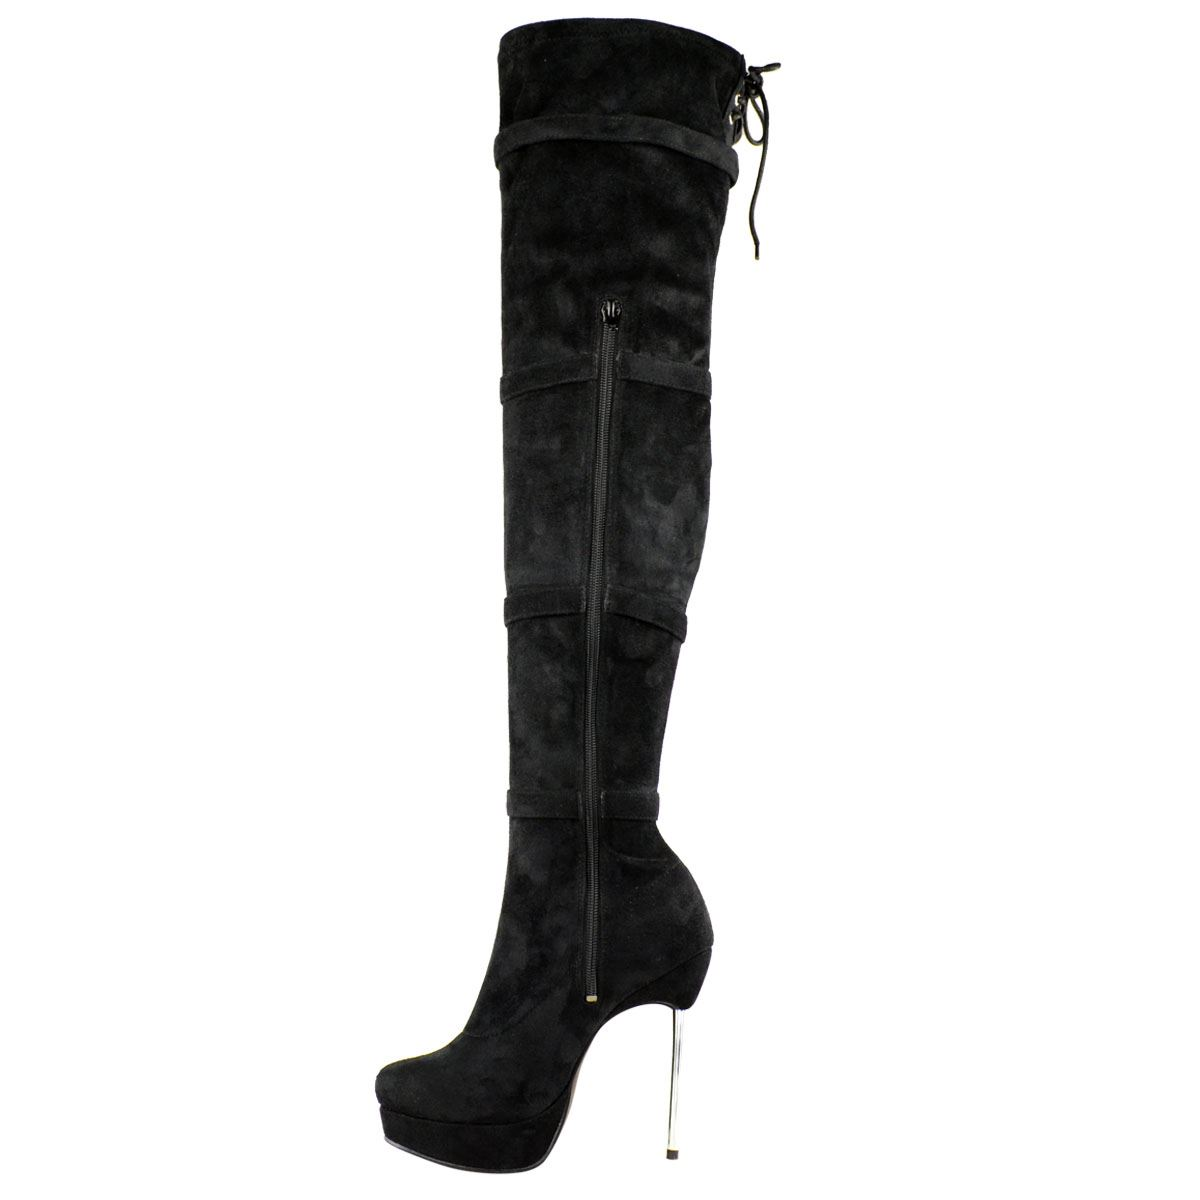 Damen Overknee-Stiefel - High Heels & Plateau - weiter